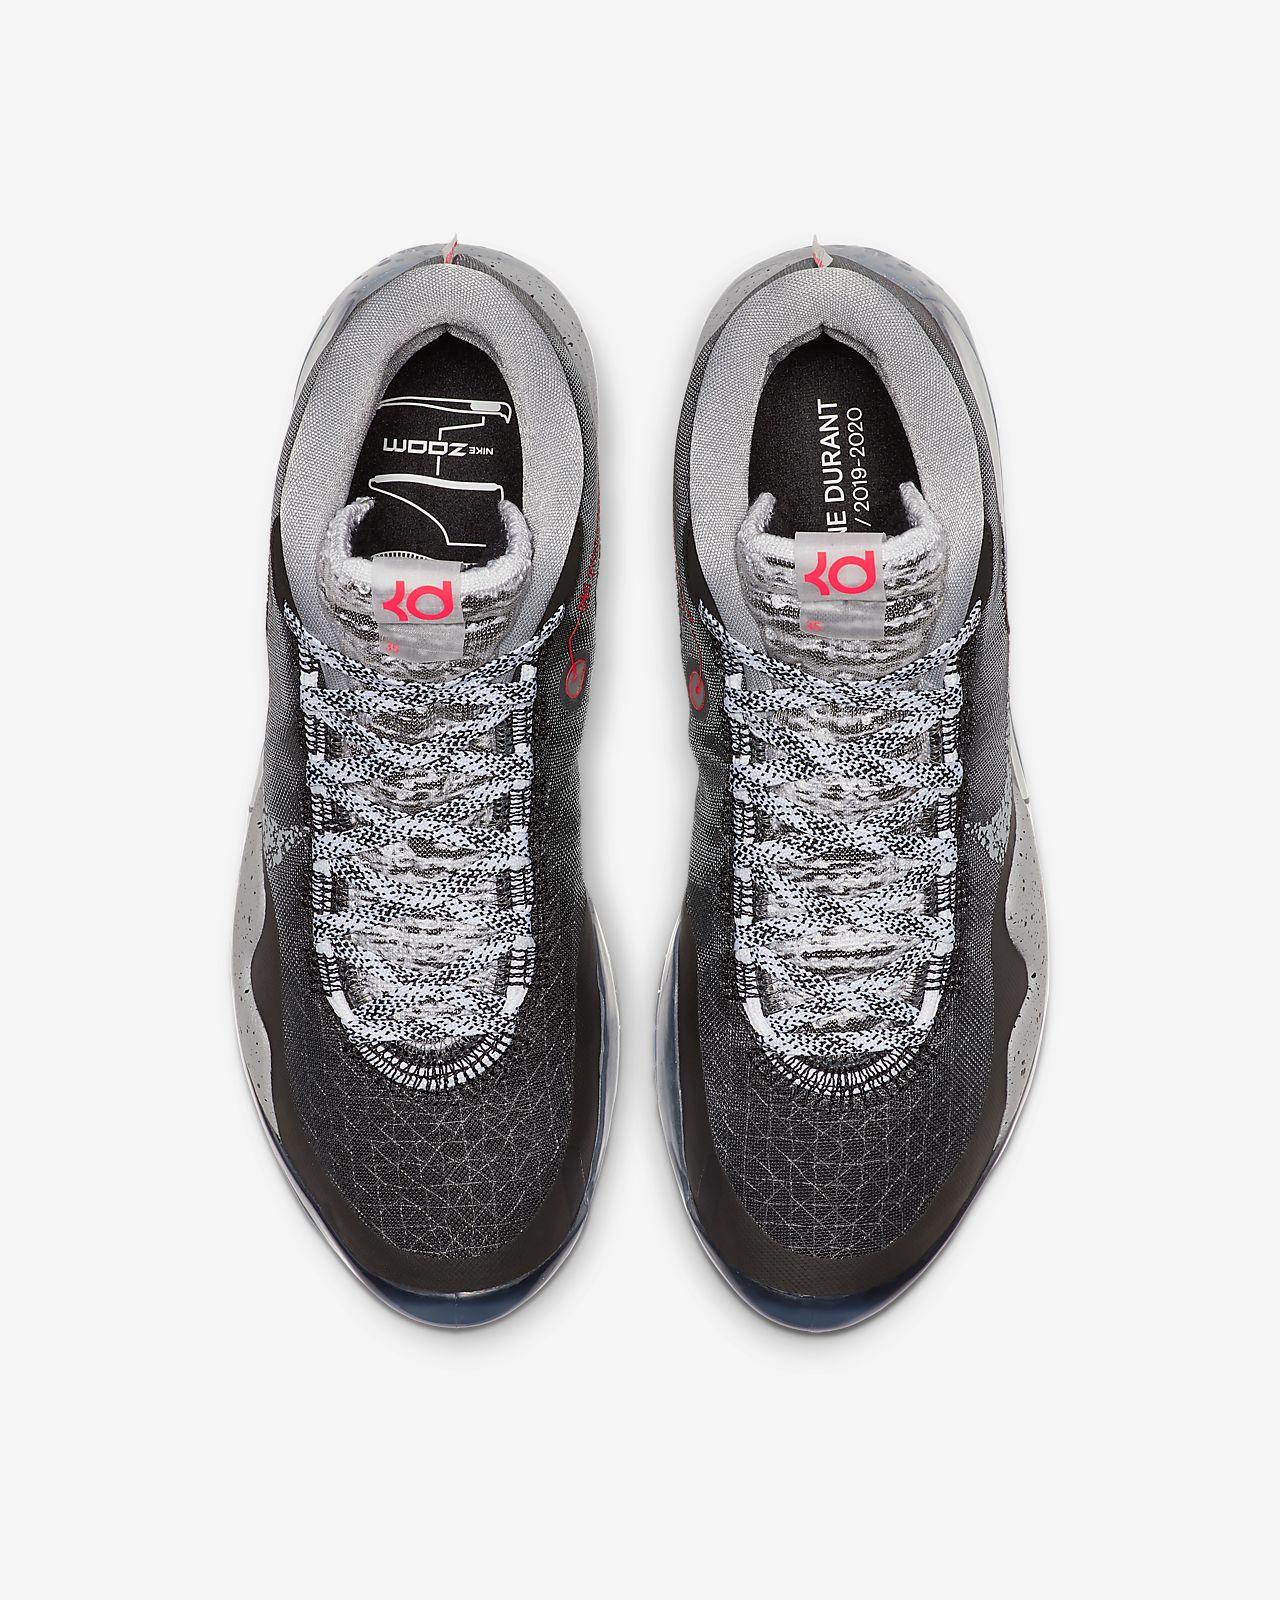 Conception innovante 94a55 a4e32 Nike Zoom KD12 Basketball Shoe